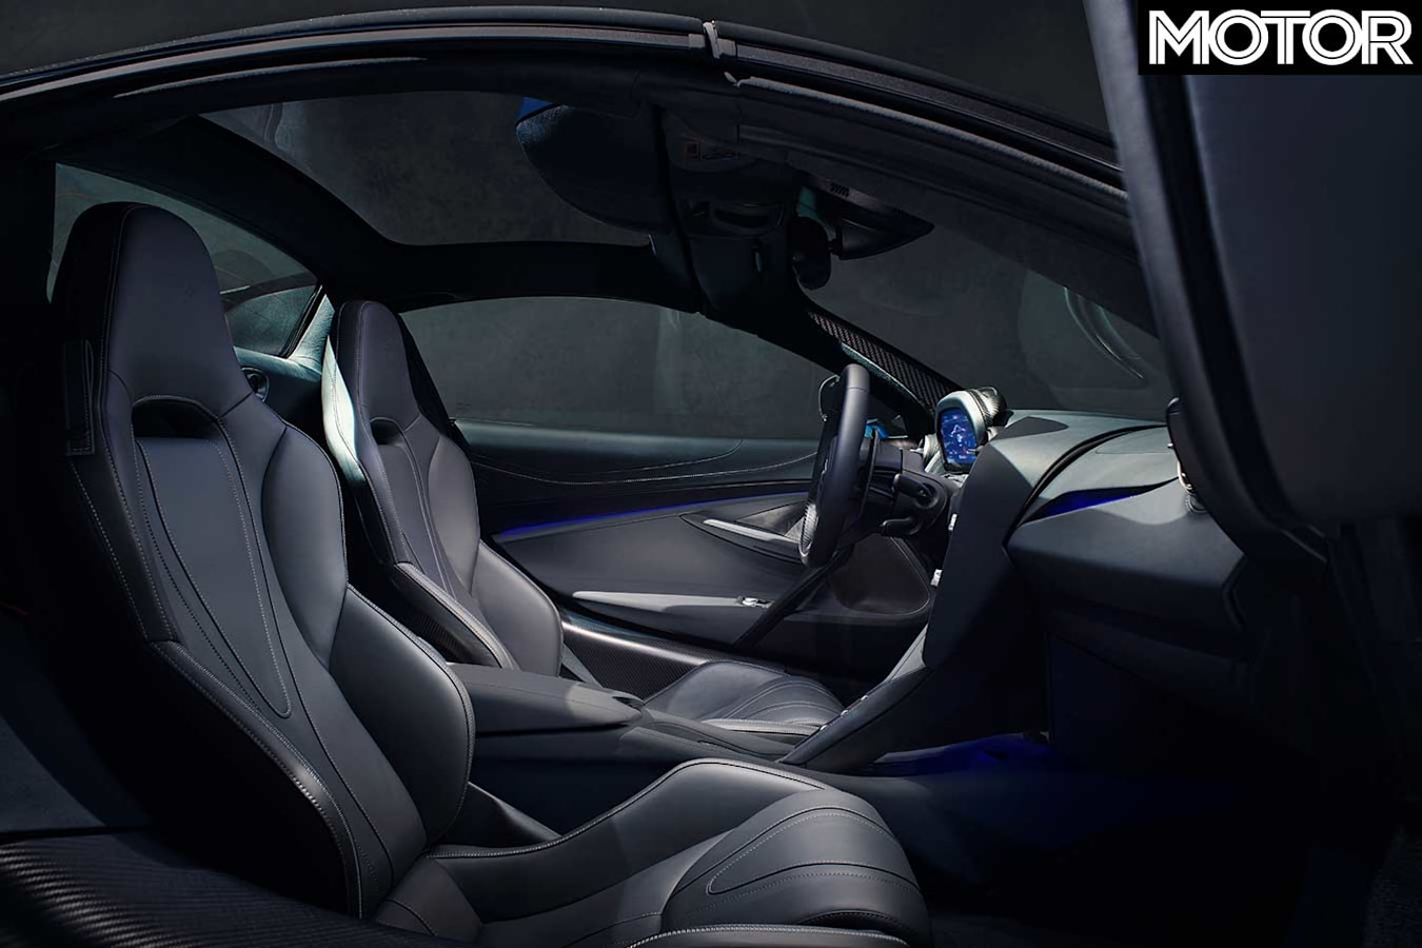 2019 Mc Laren 720 S Spider Interior Jpg